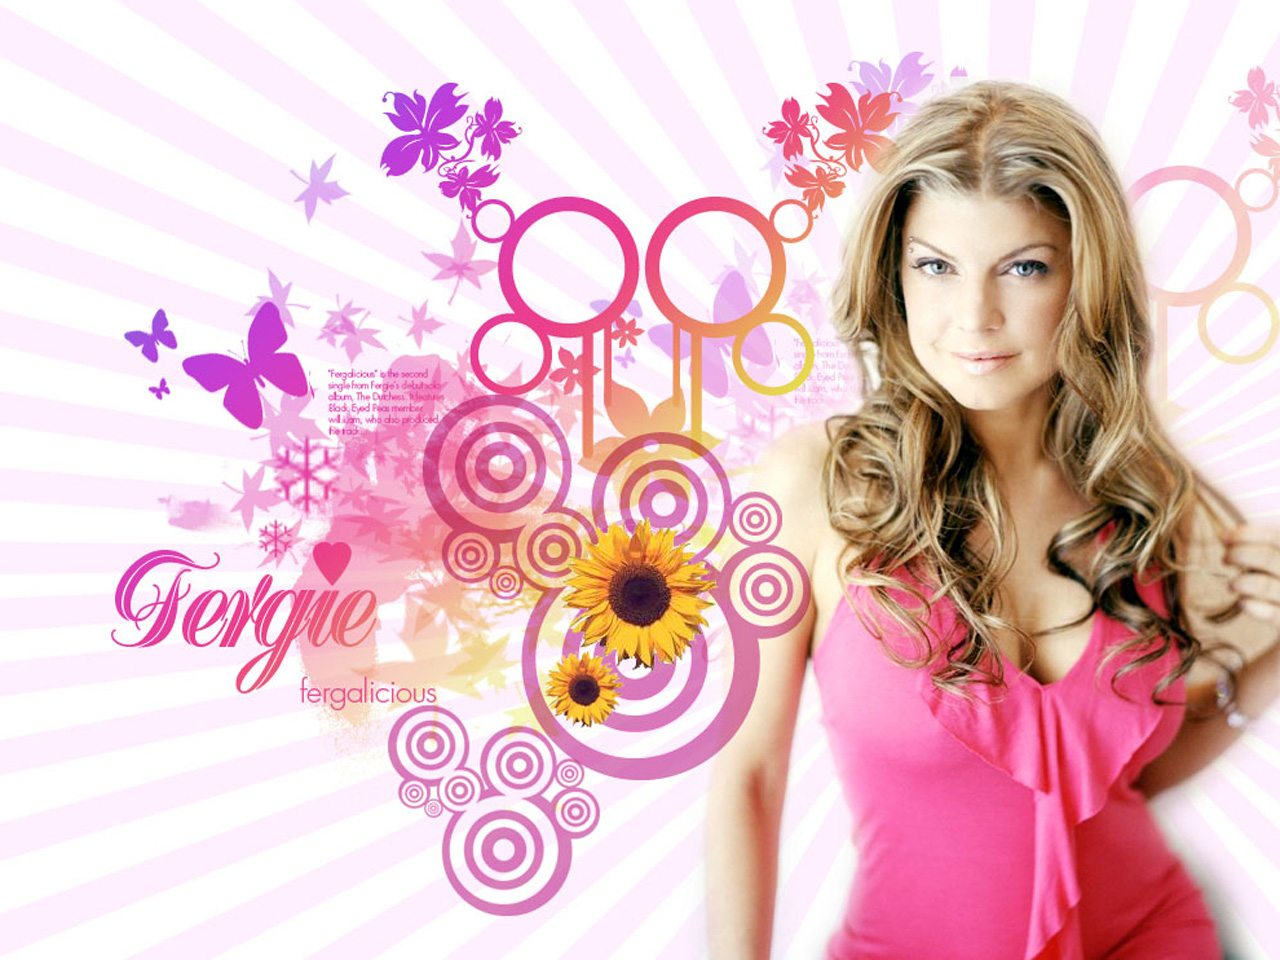 http://4.bp.blogspot.com/_FvRvLQTJ5dE/TVA5uUzcAUI/AAAAAAAAACM/2O5DDrhPaZg/s1600/fergie-wallpaper-93fd4.jpg